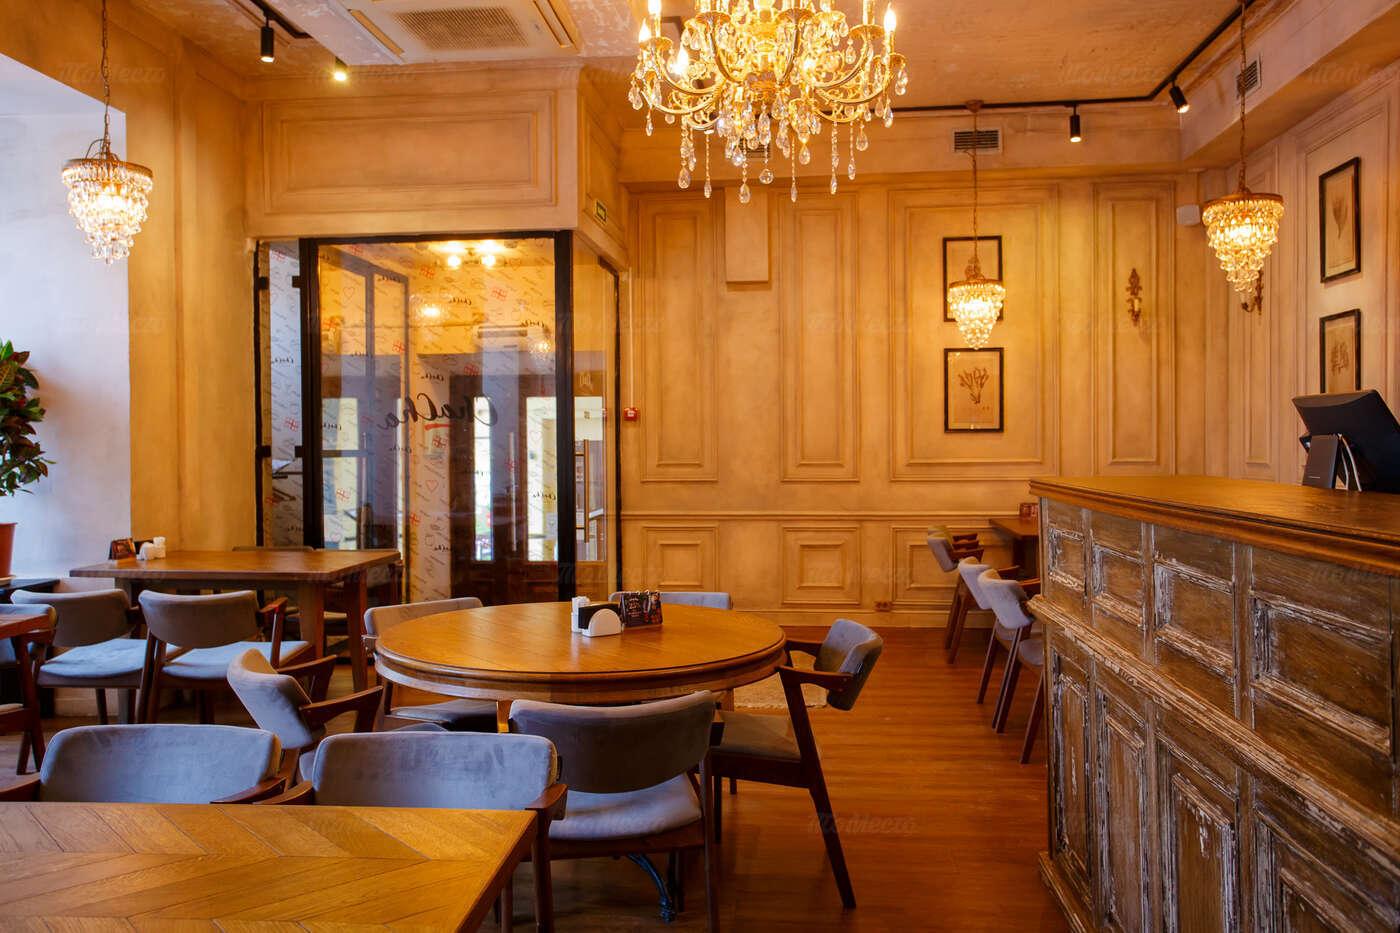 Ресторан Чача на набережной канала Грибоедова фото 17